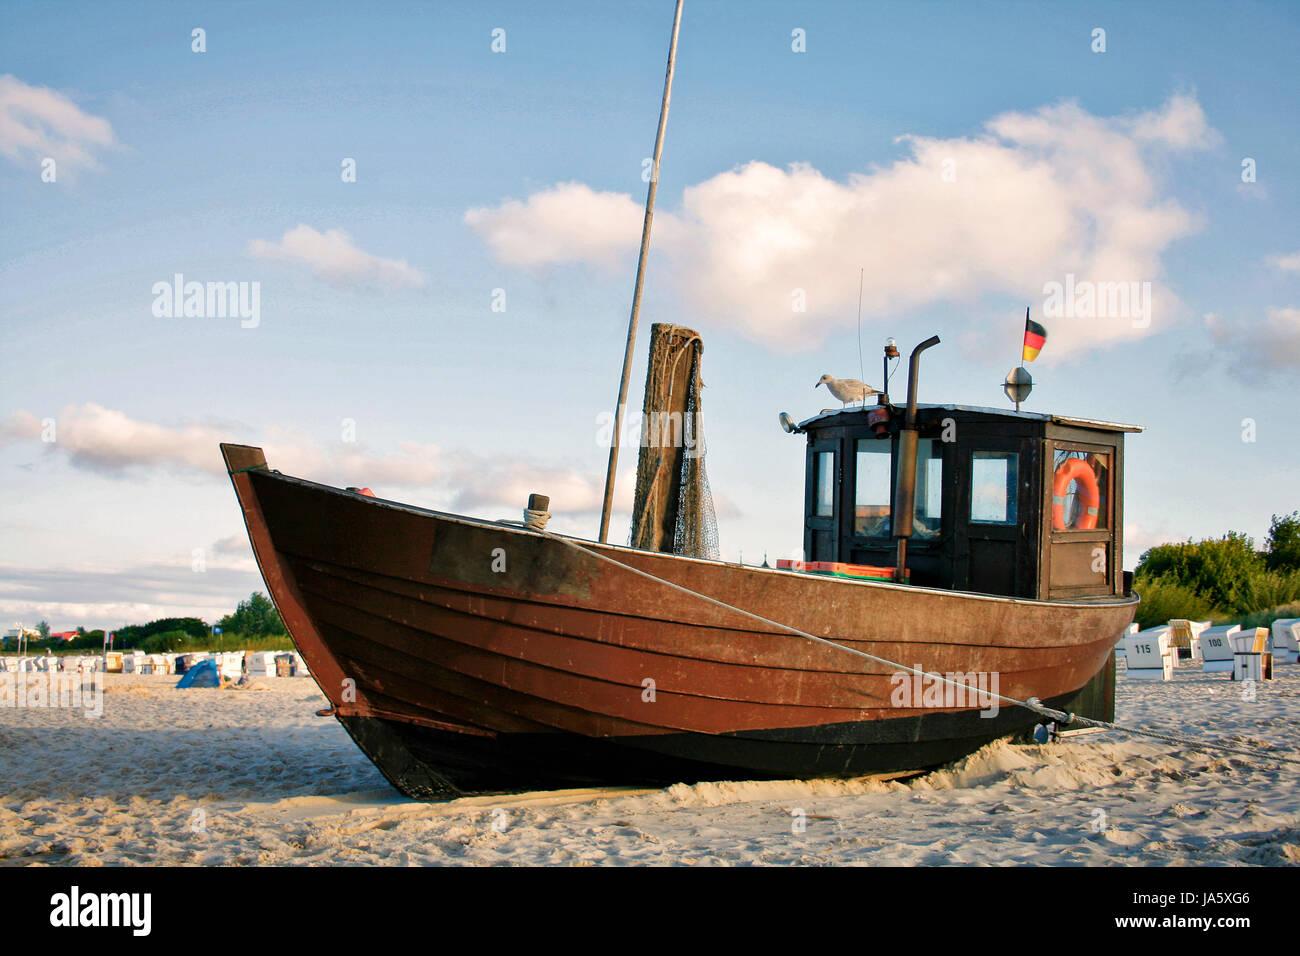 water, baltic sea, salt water, sea, ocean, fishing boat, boat, fishing ship, Stock Photo